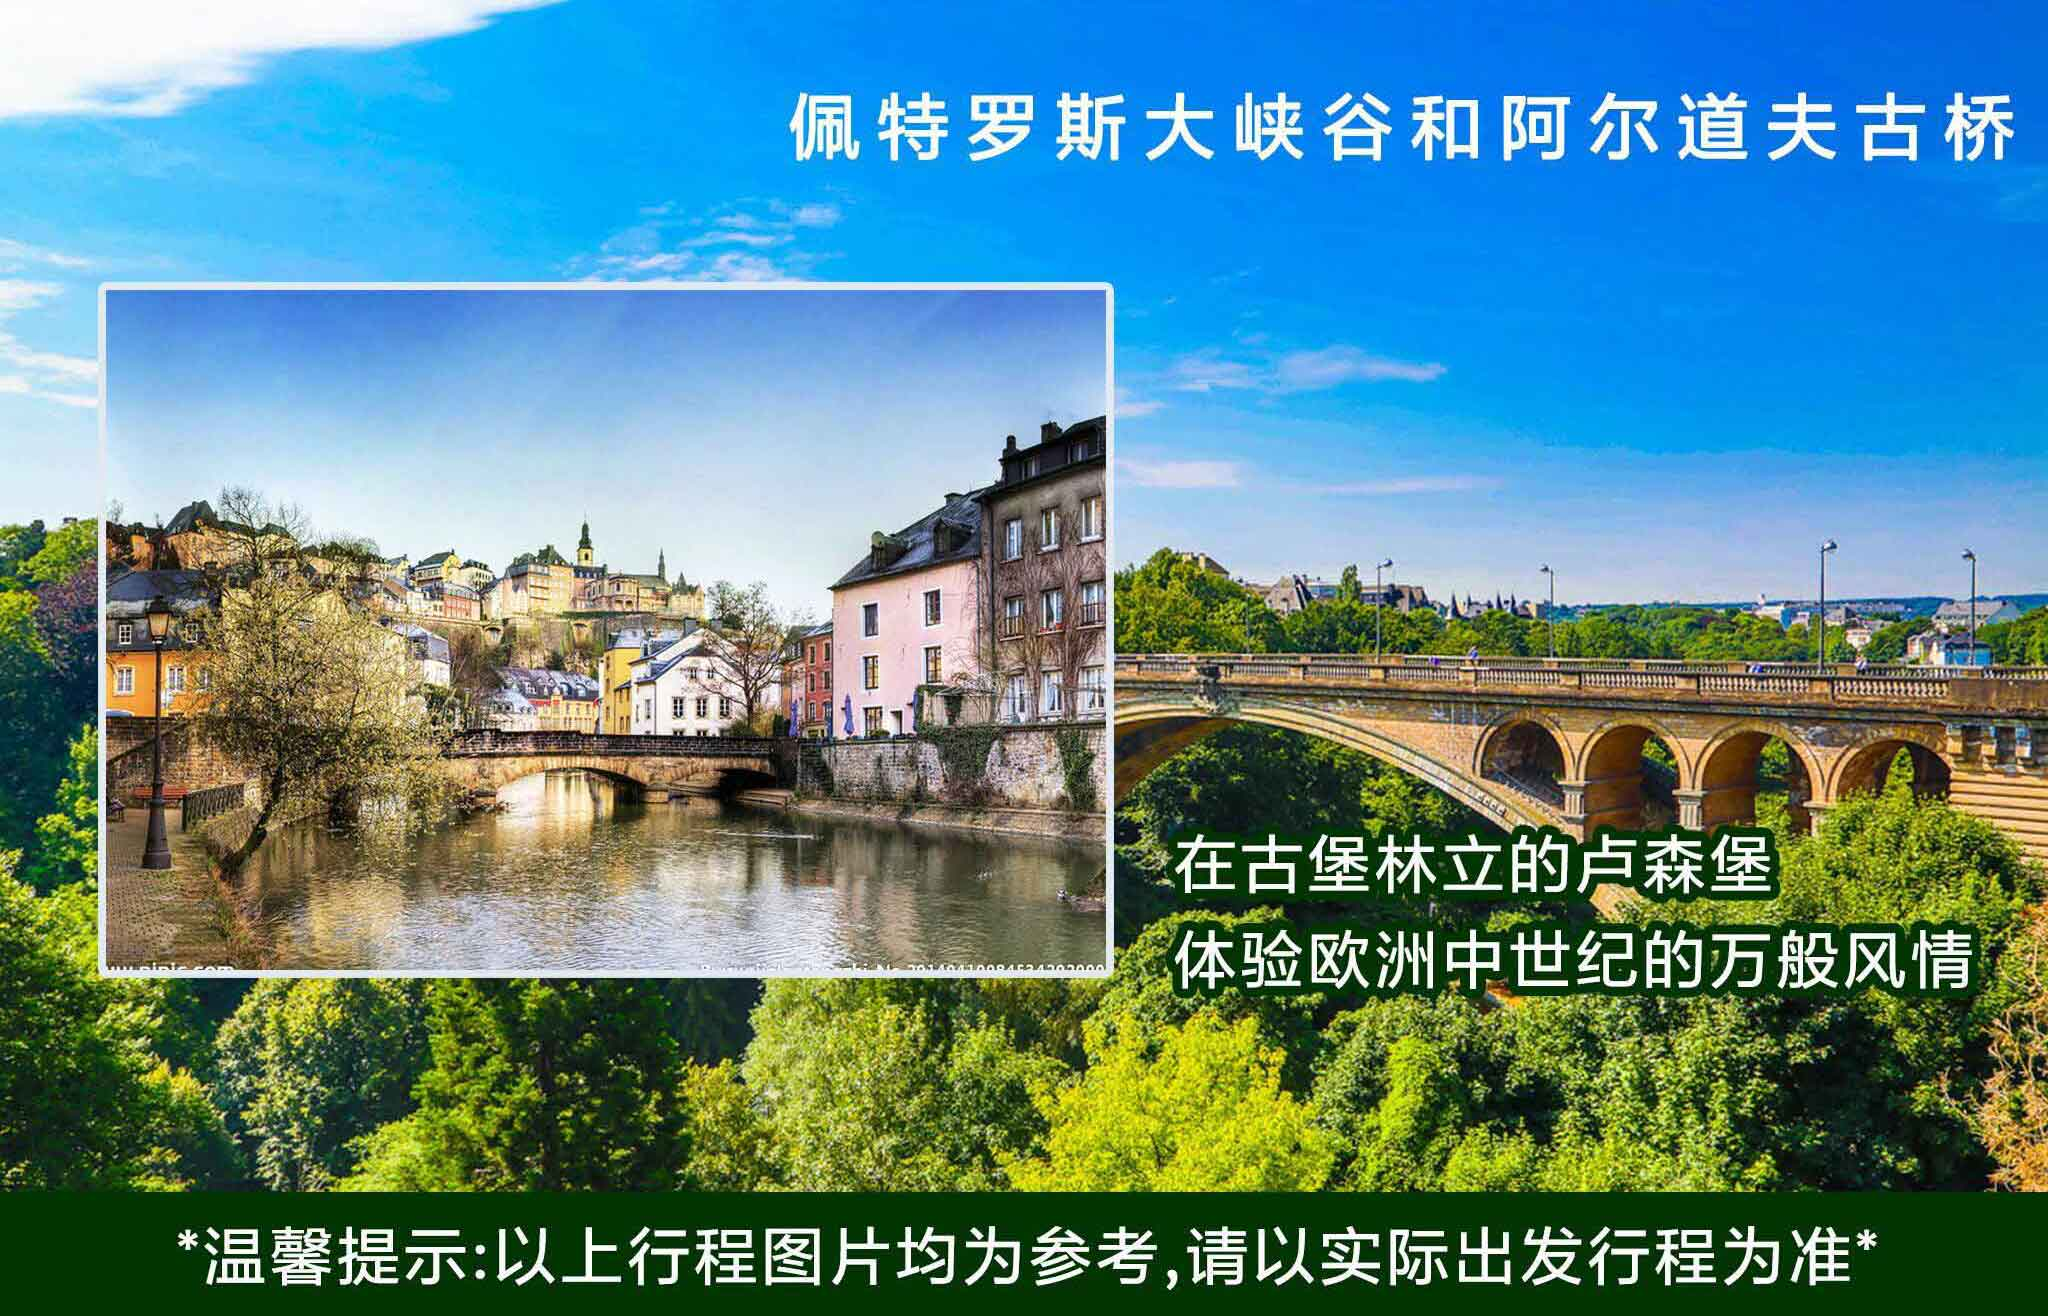 images/6/merch/109/r68fc6sAk9hgP161q76SP1D4c44c11.jpg